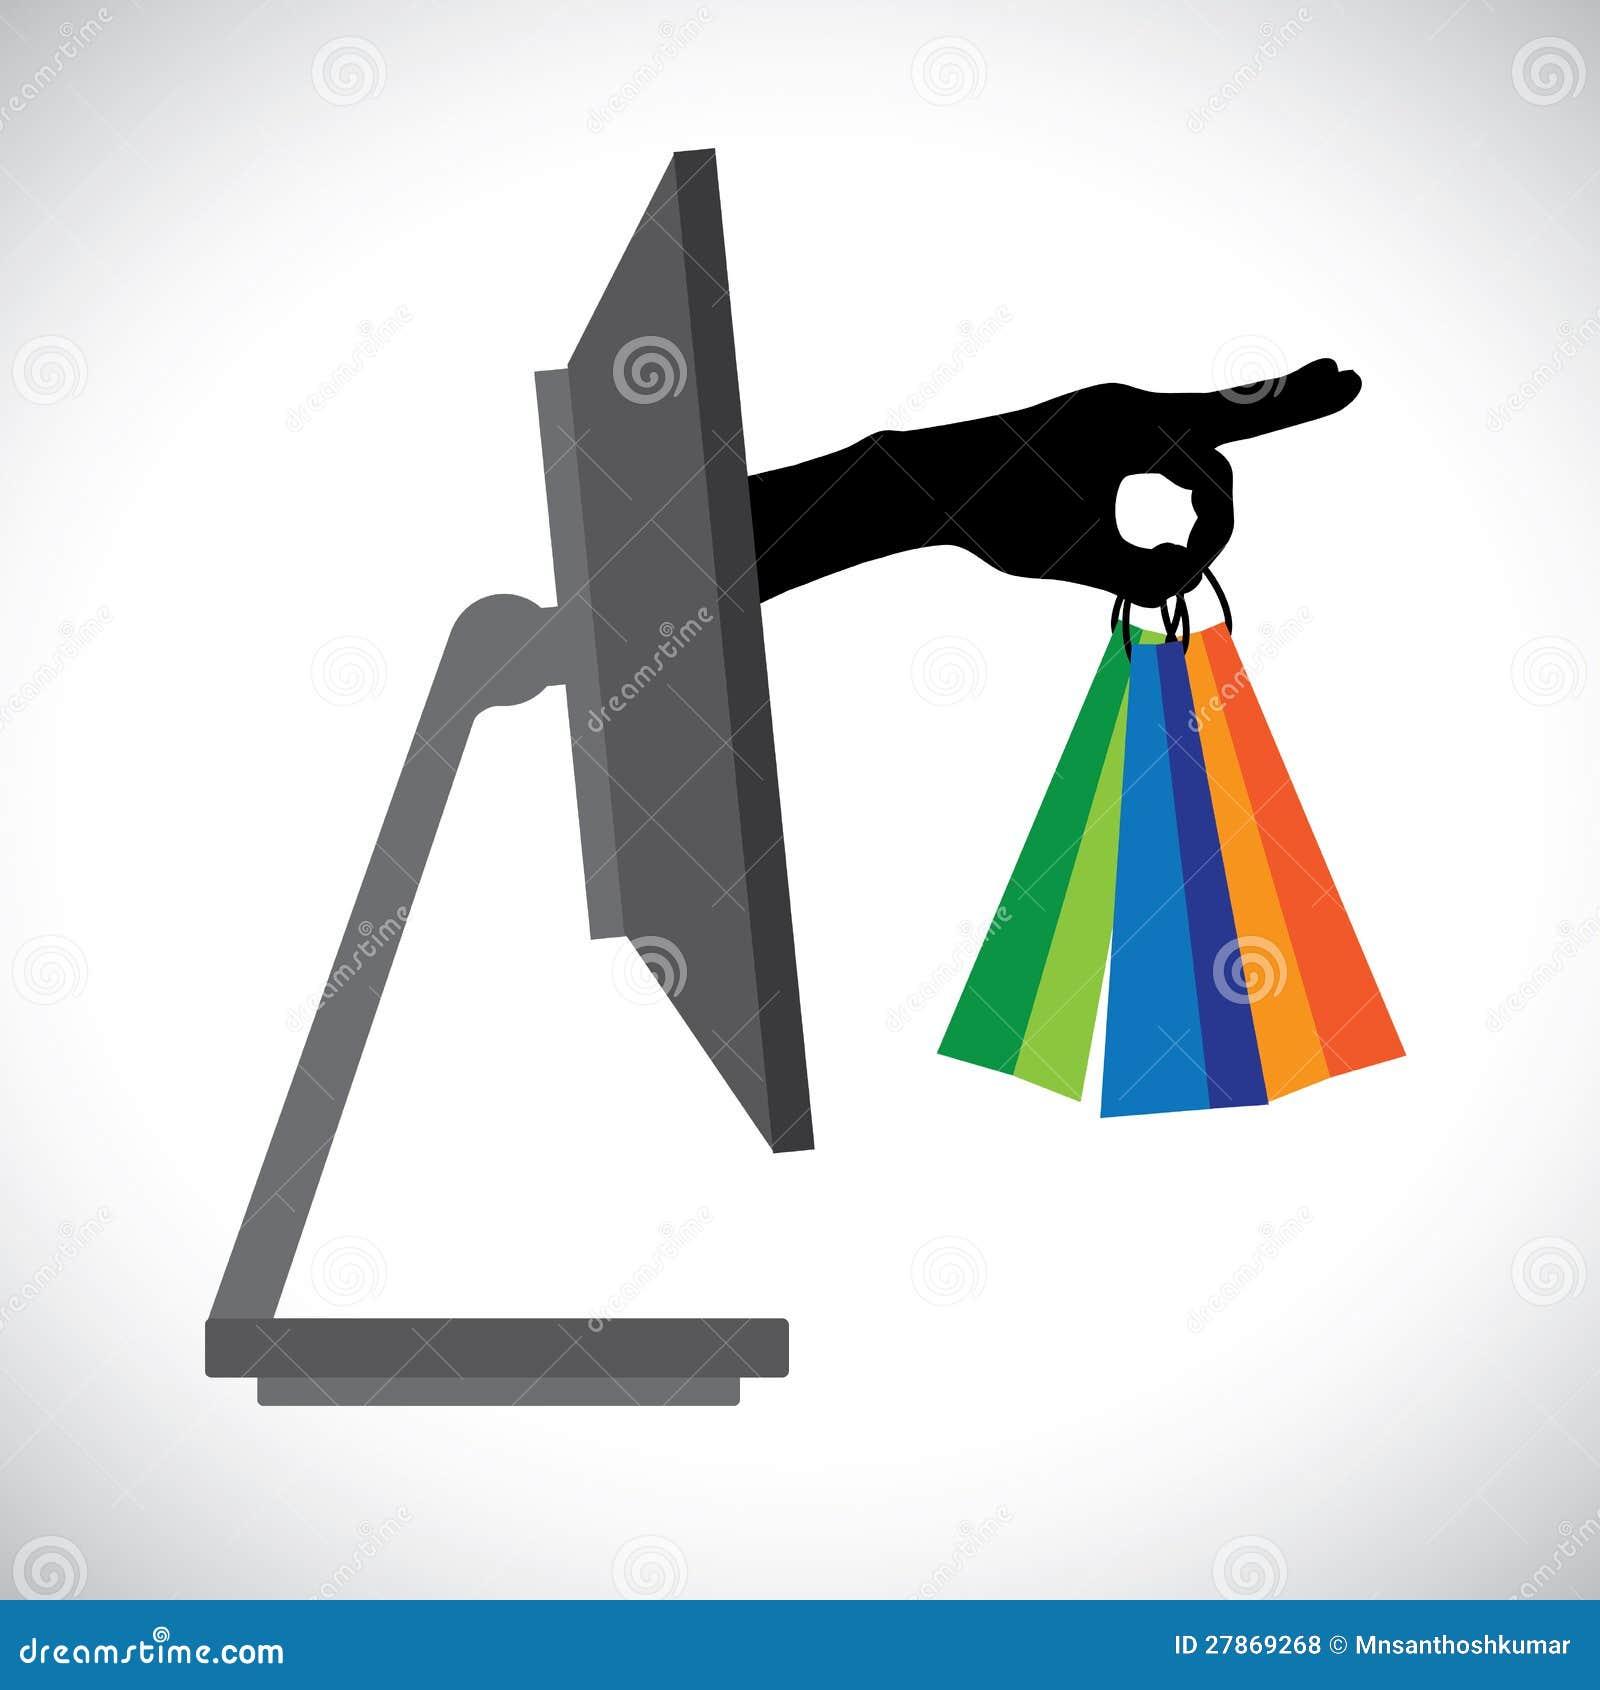 Buying/shopping online using modern technology(PC)